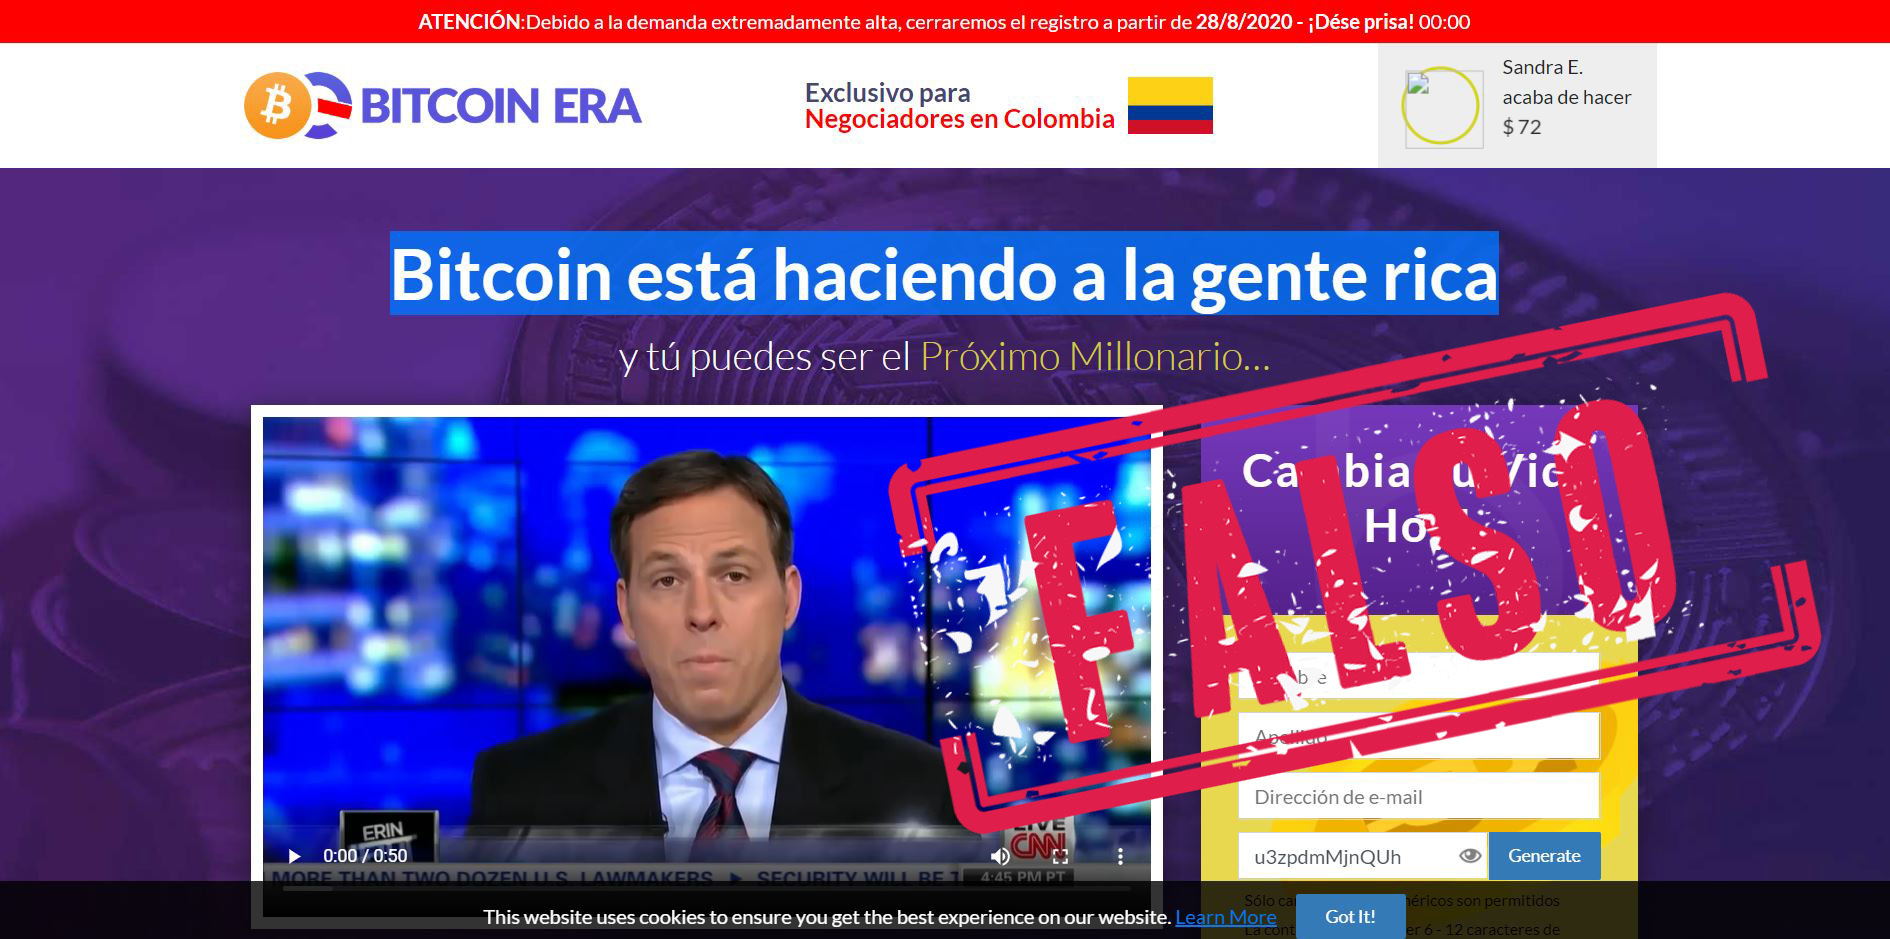 Bitcoin Era exclusivo para colombianos